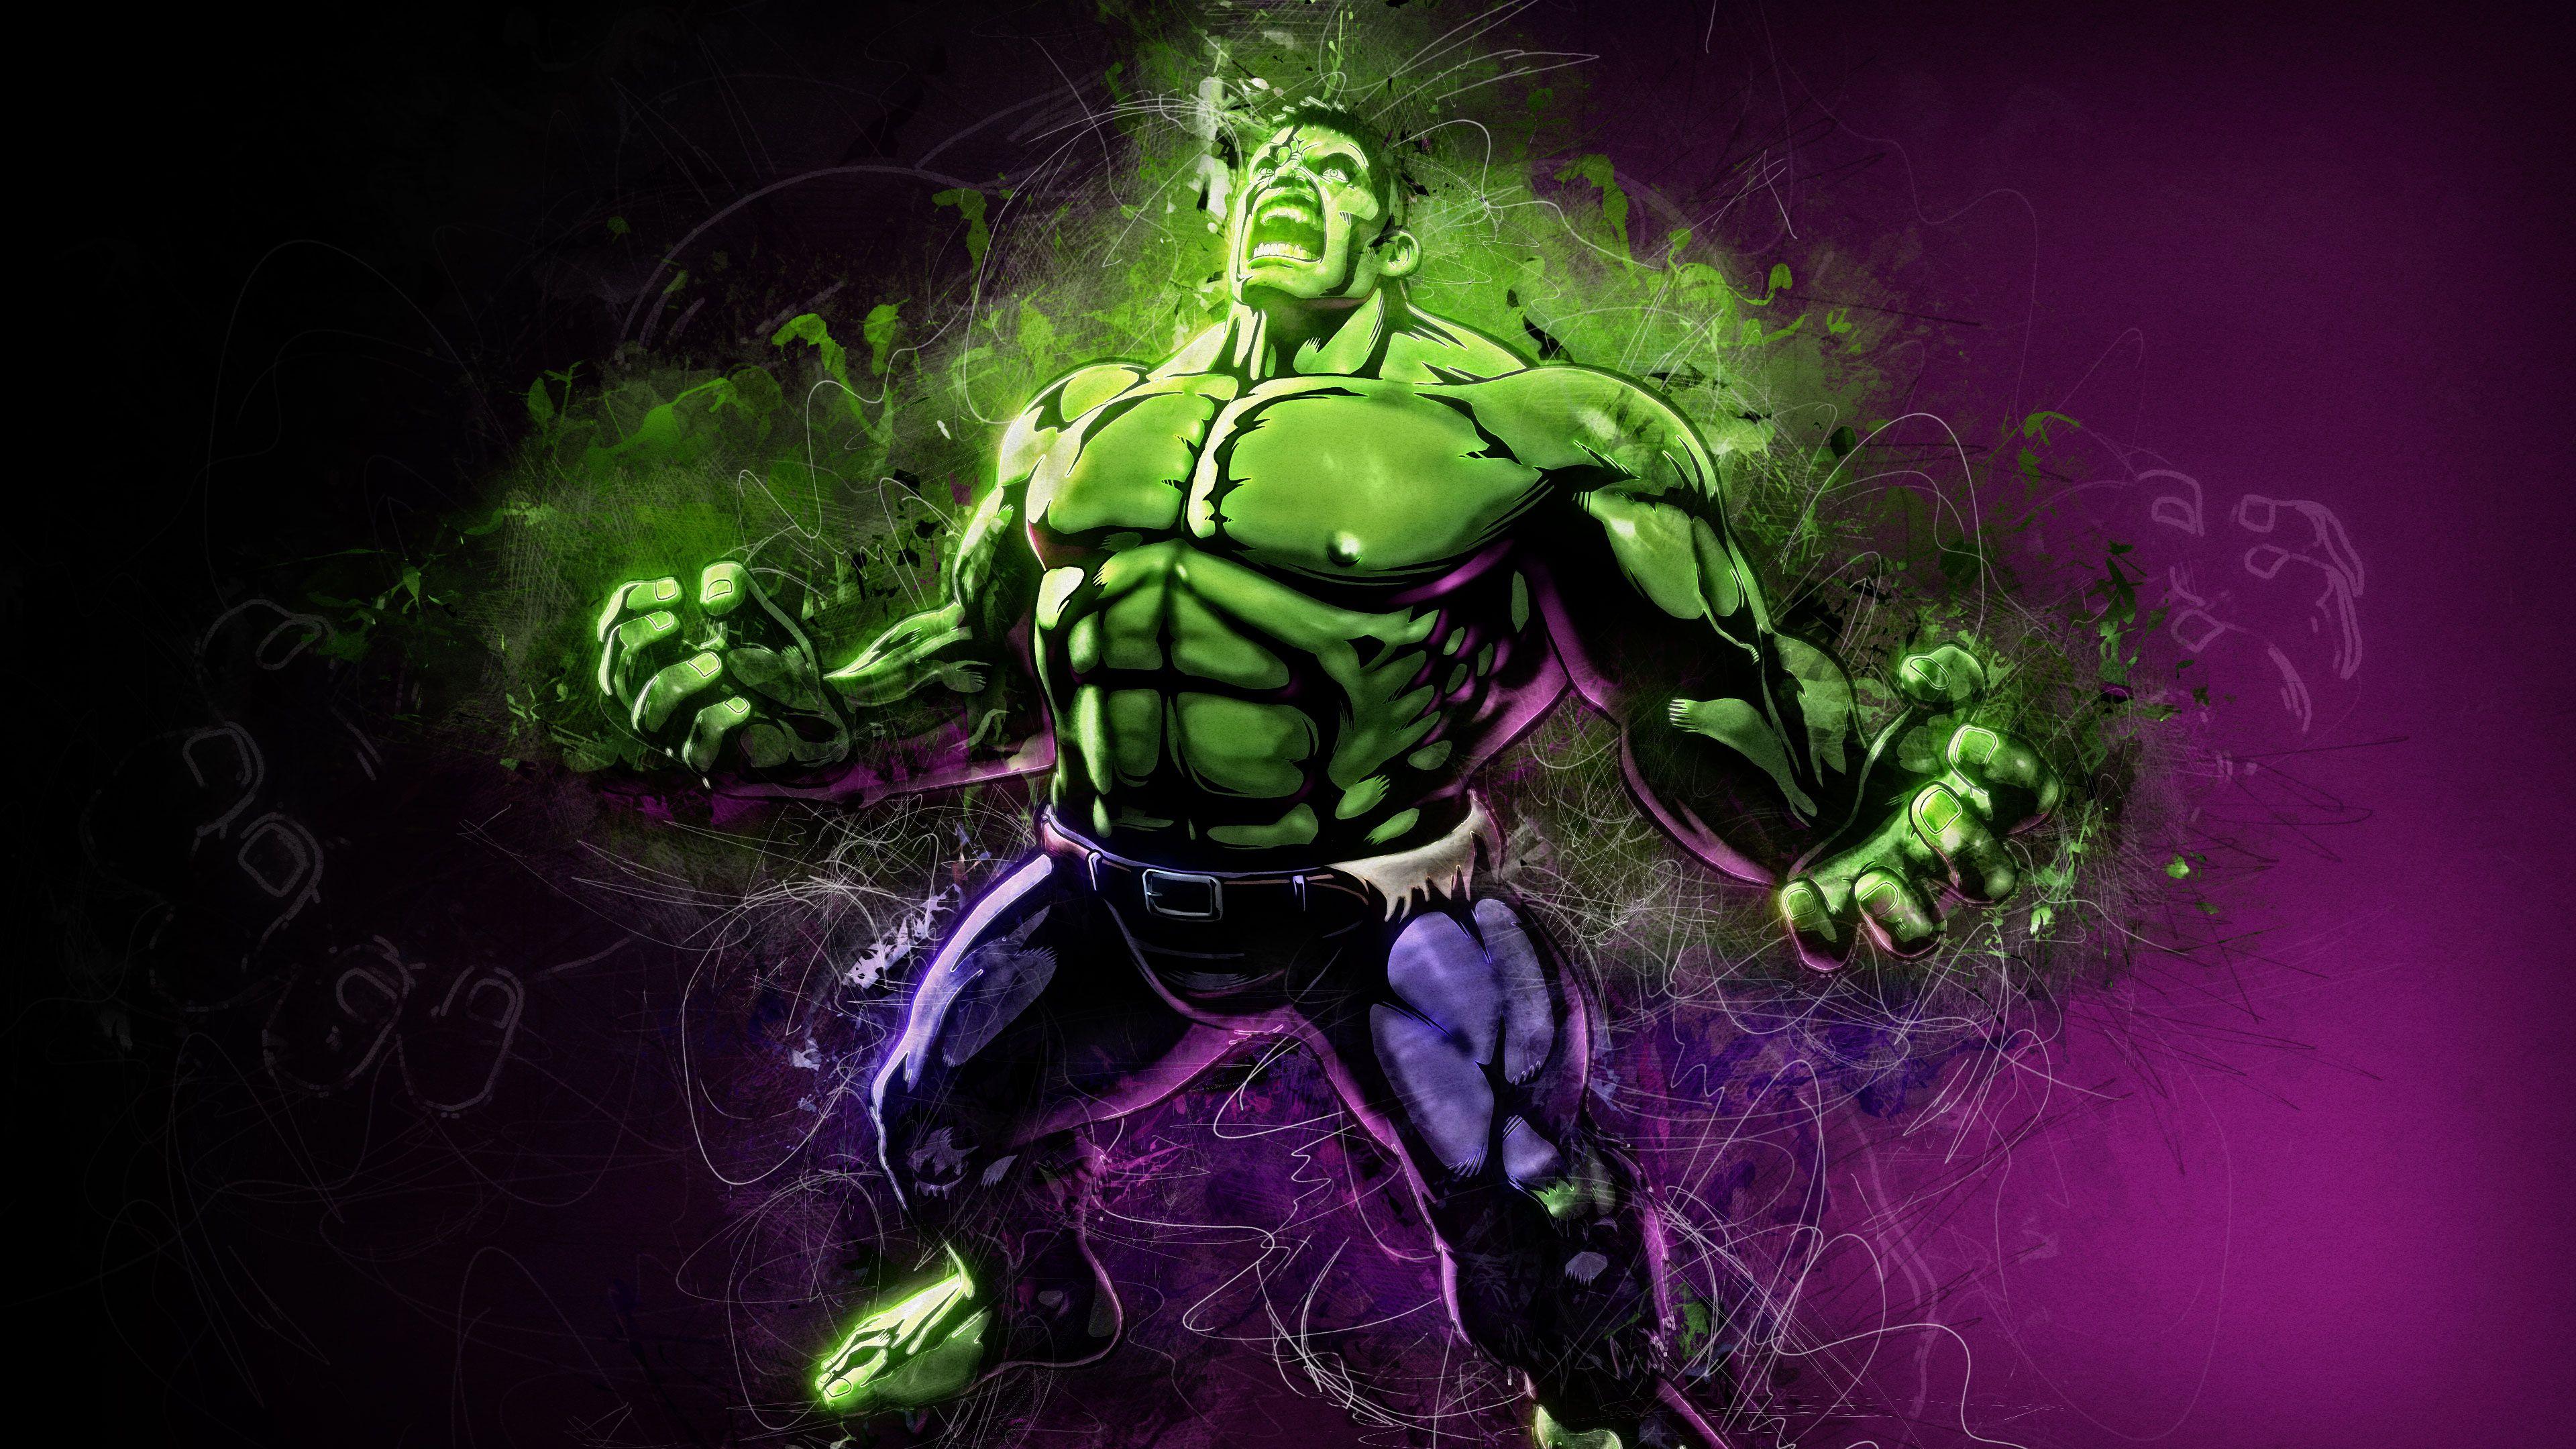 Hulk Artwork 4K HD Hulk artwork, Hulk art, Artwork